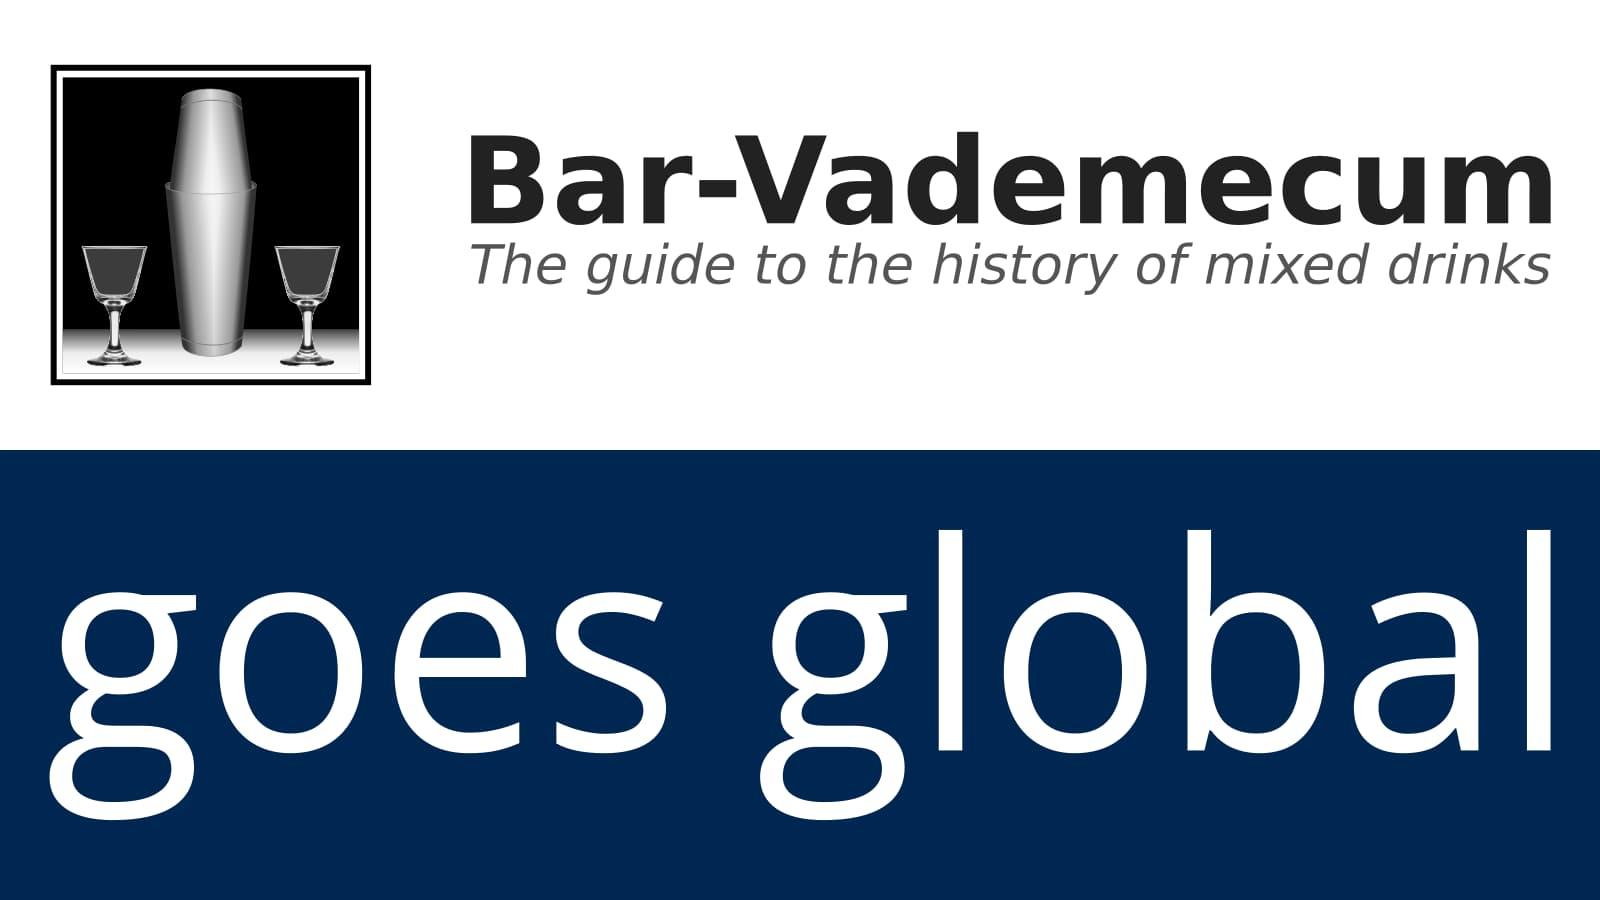 Bar-Vademecum goes global.